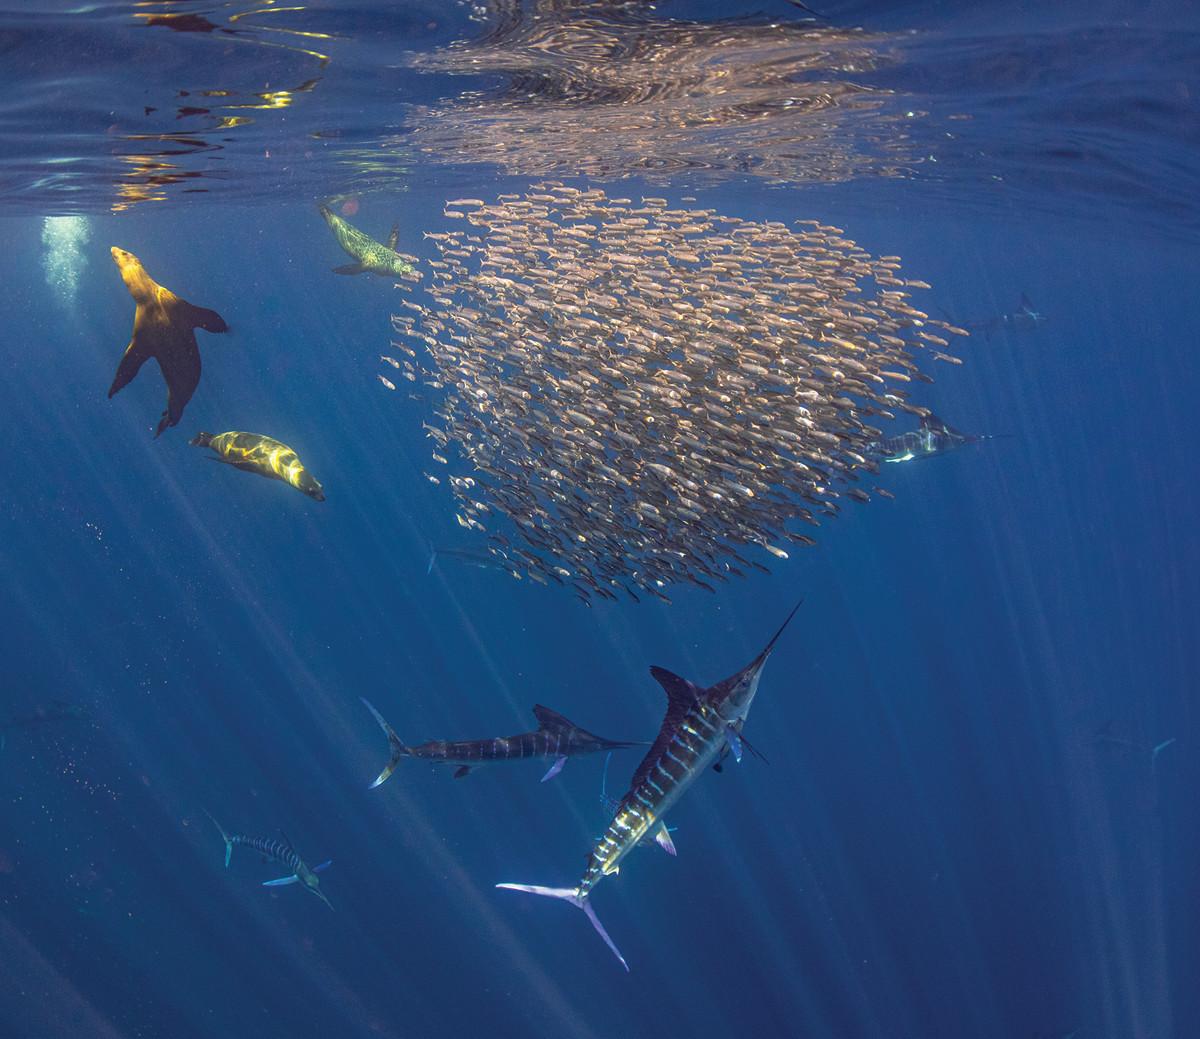 A host of predators bombards a school of sardines.